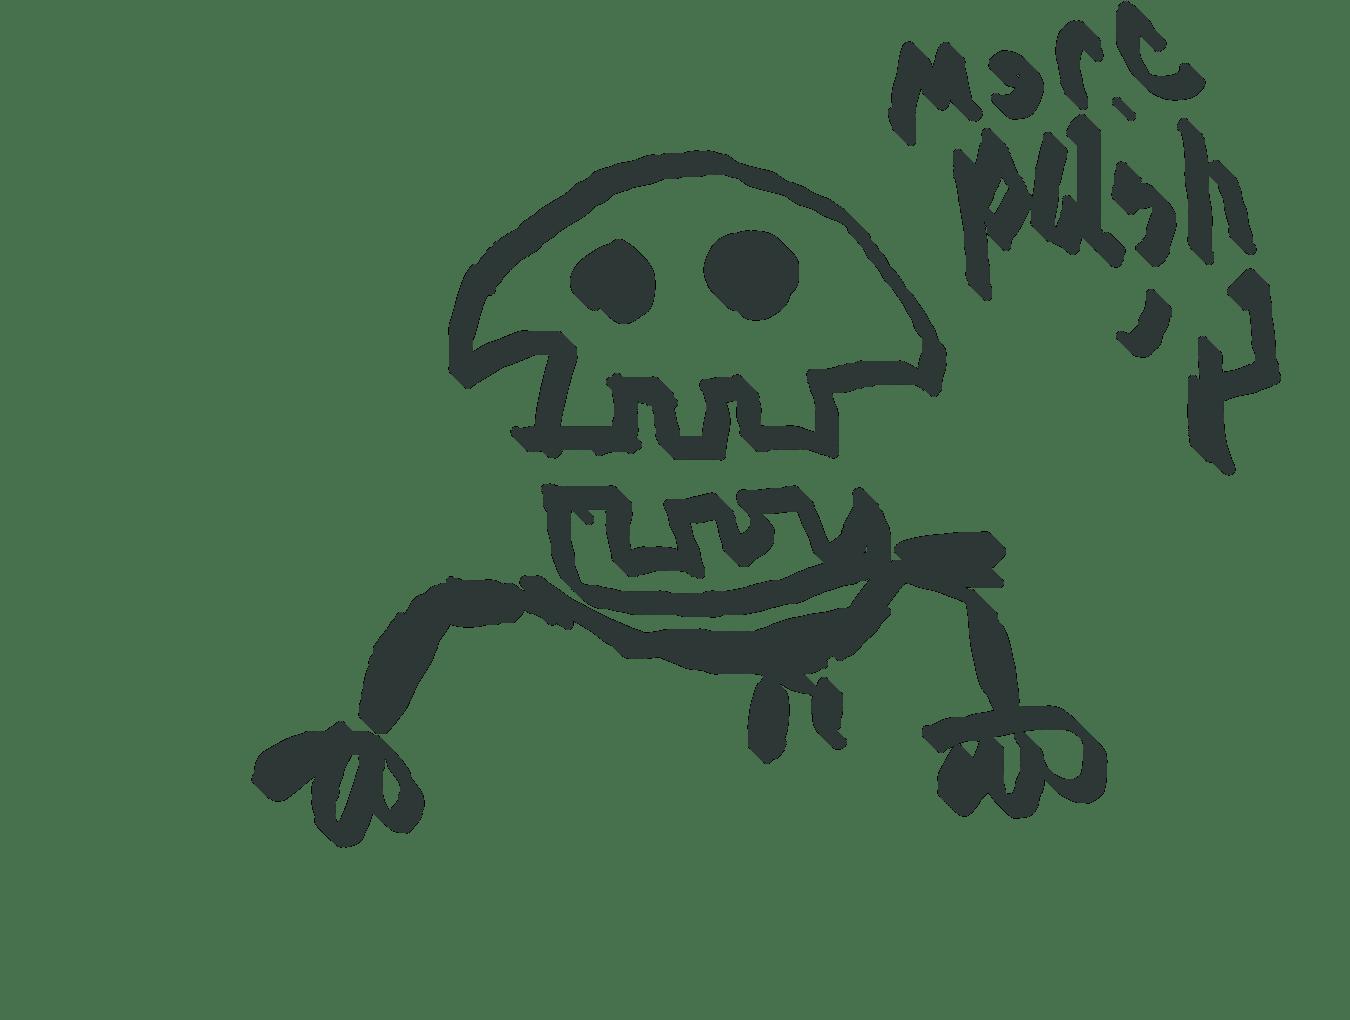 Skeleton Clipart Free Download On Webstockreview